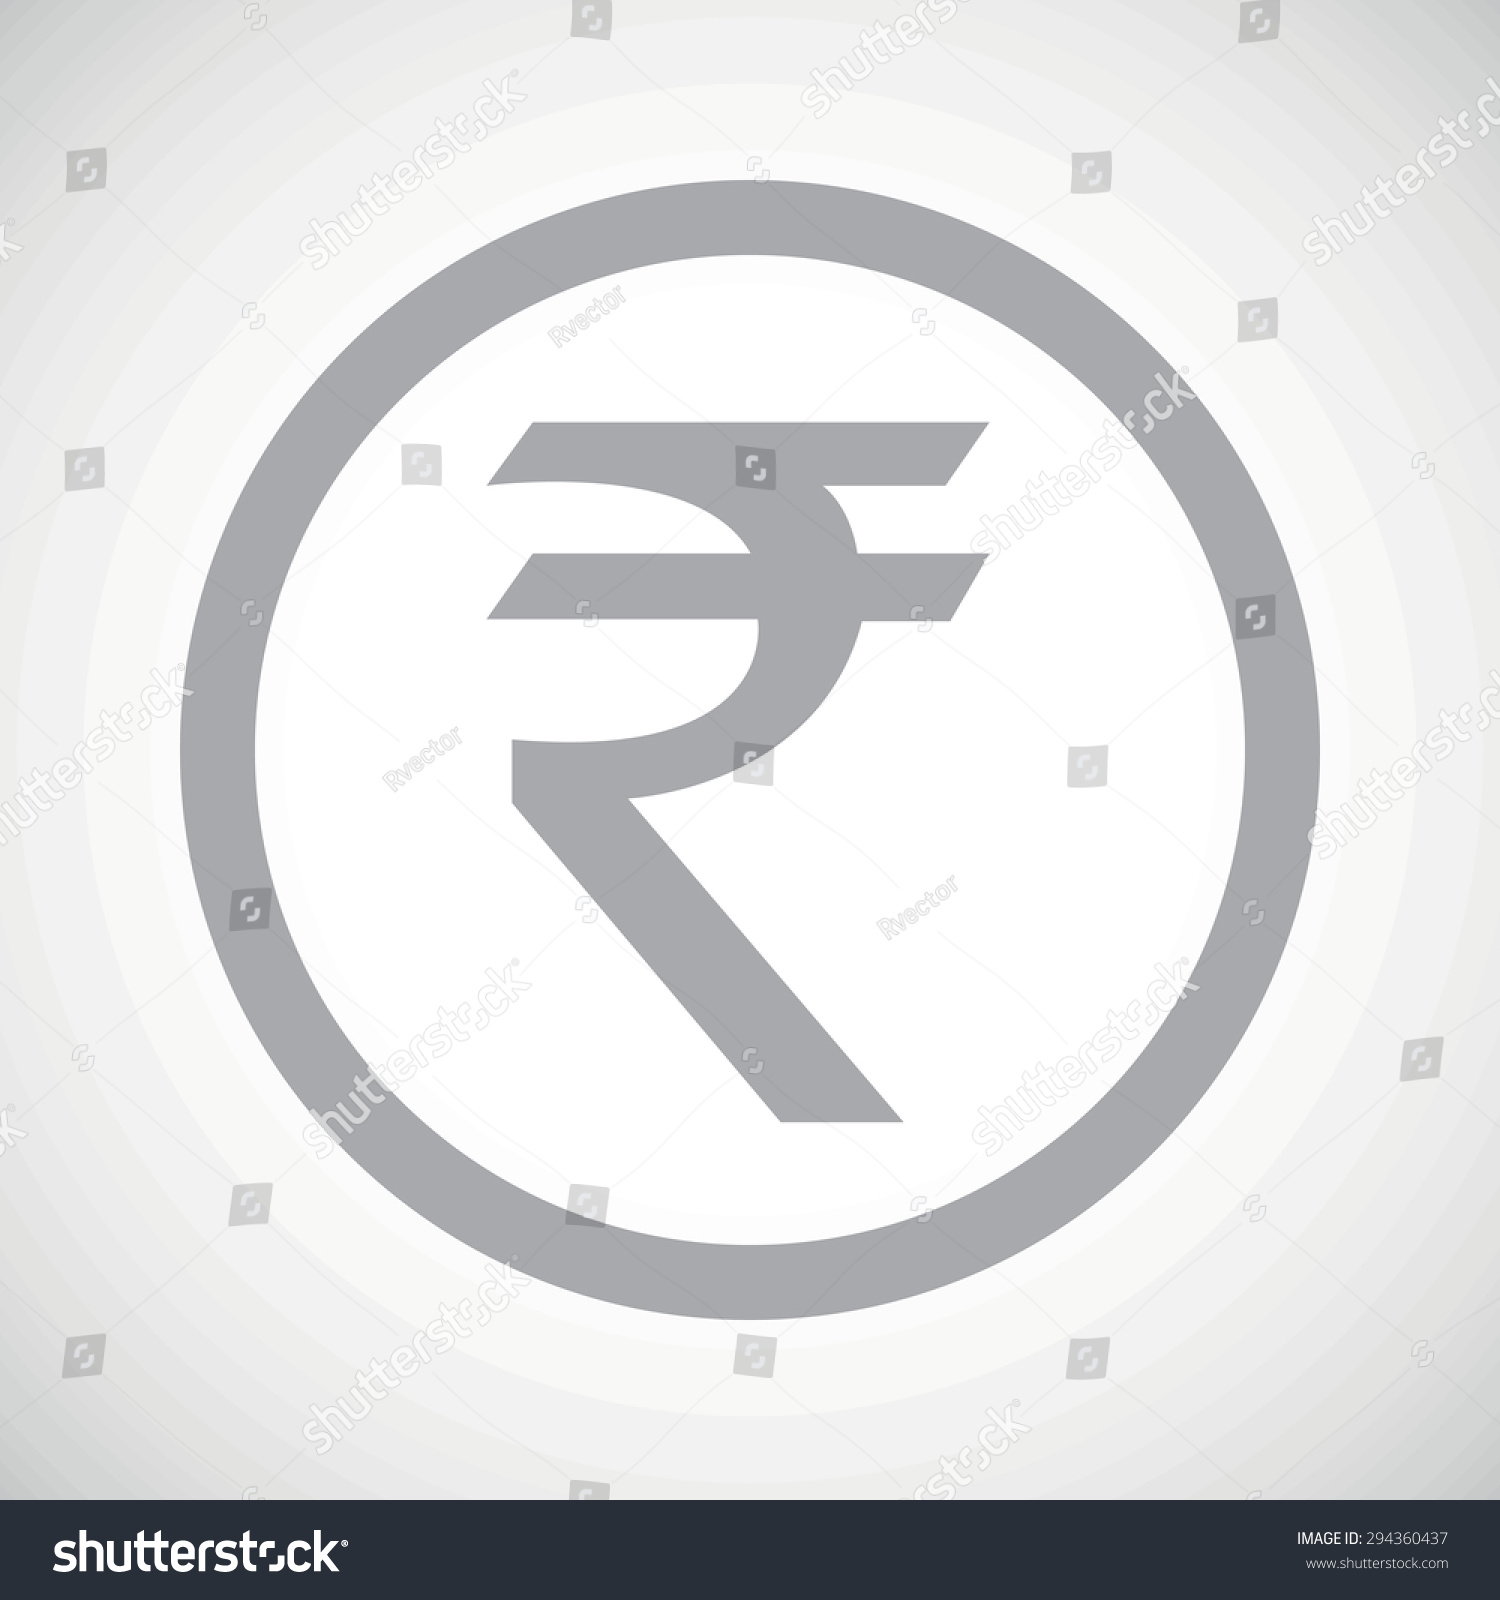 Grey Indian Rupee Symbol Circle On Stock Illustration 294360437